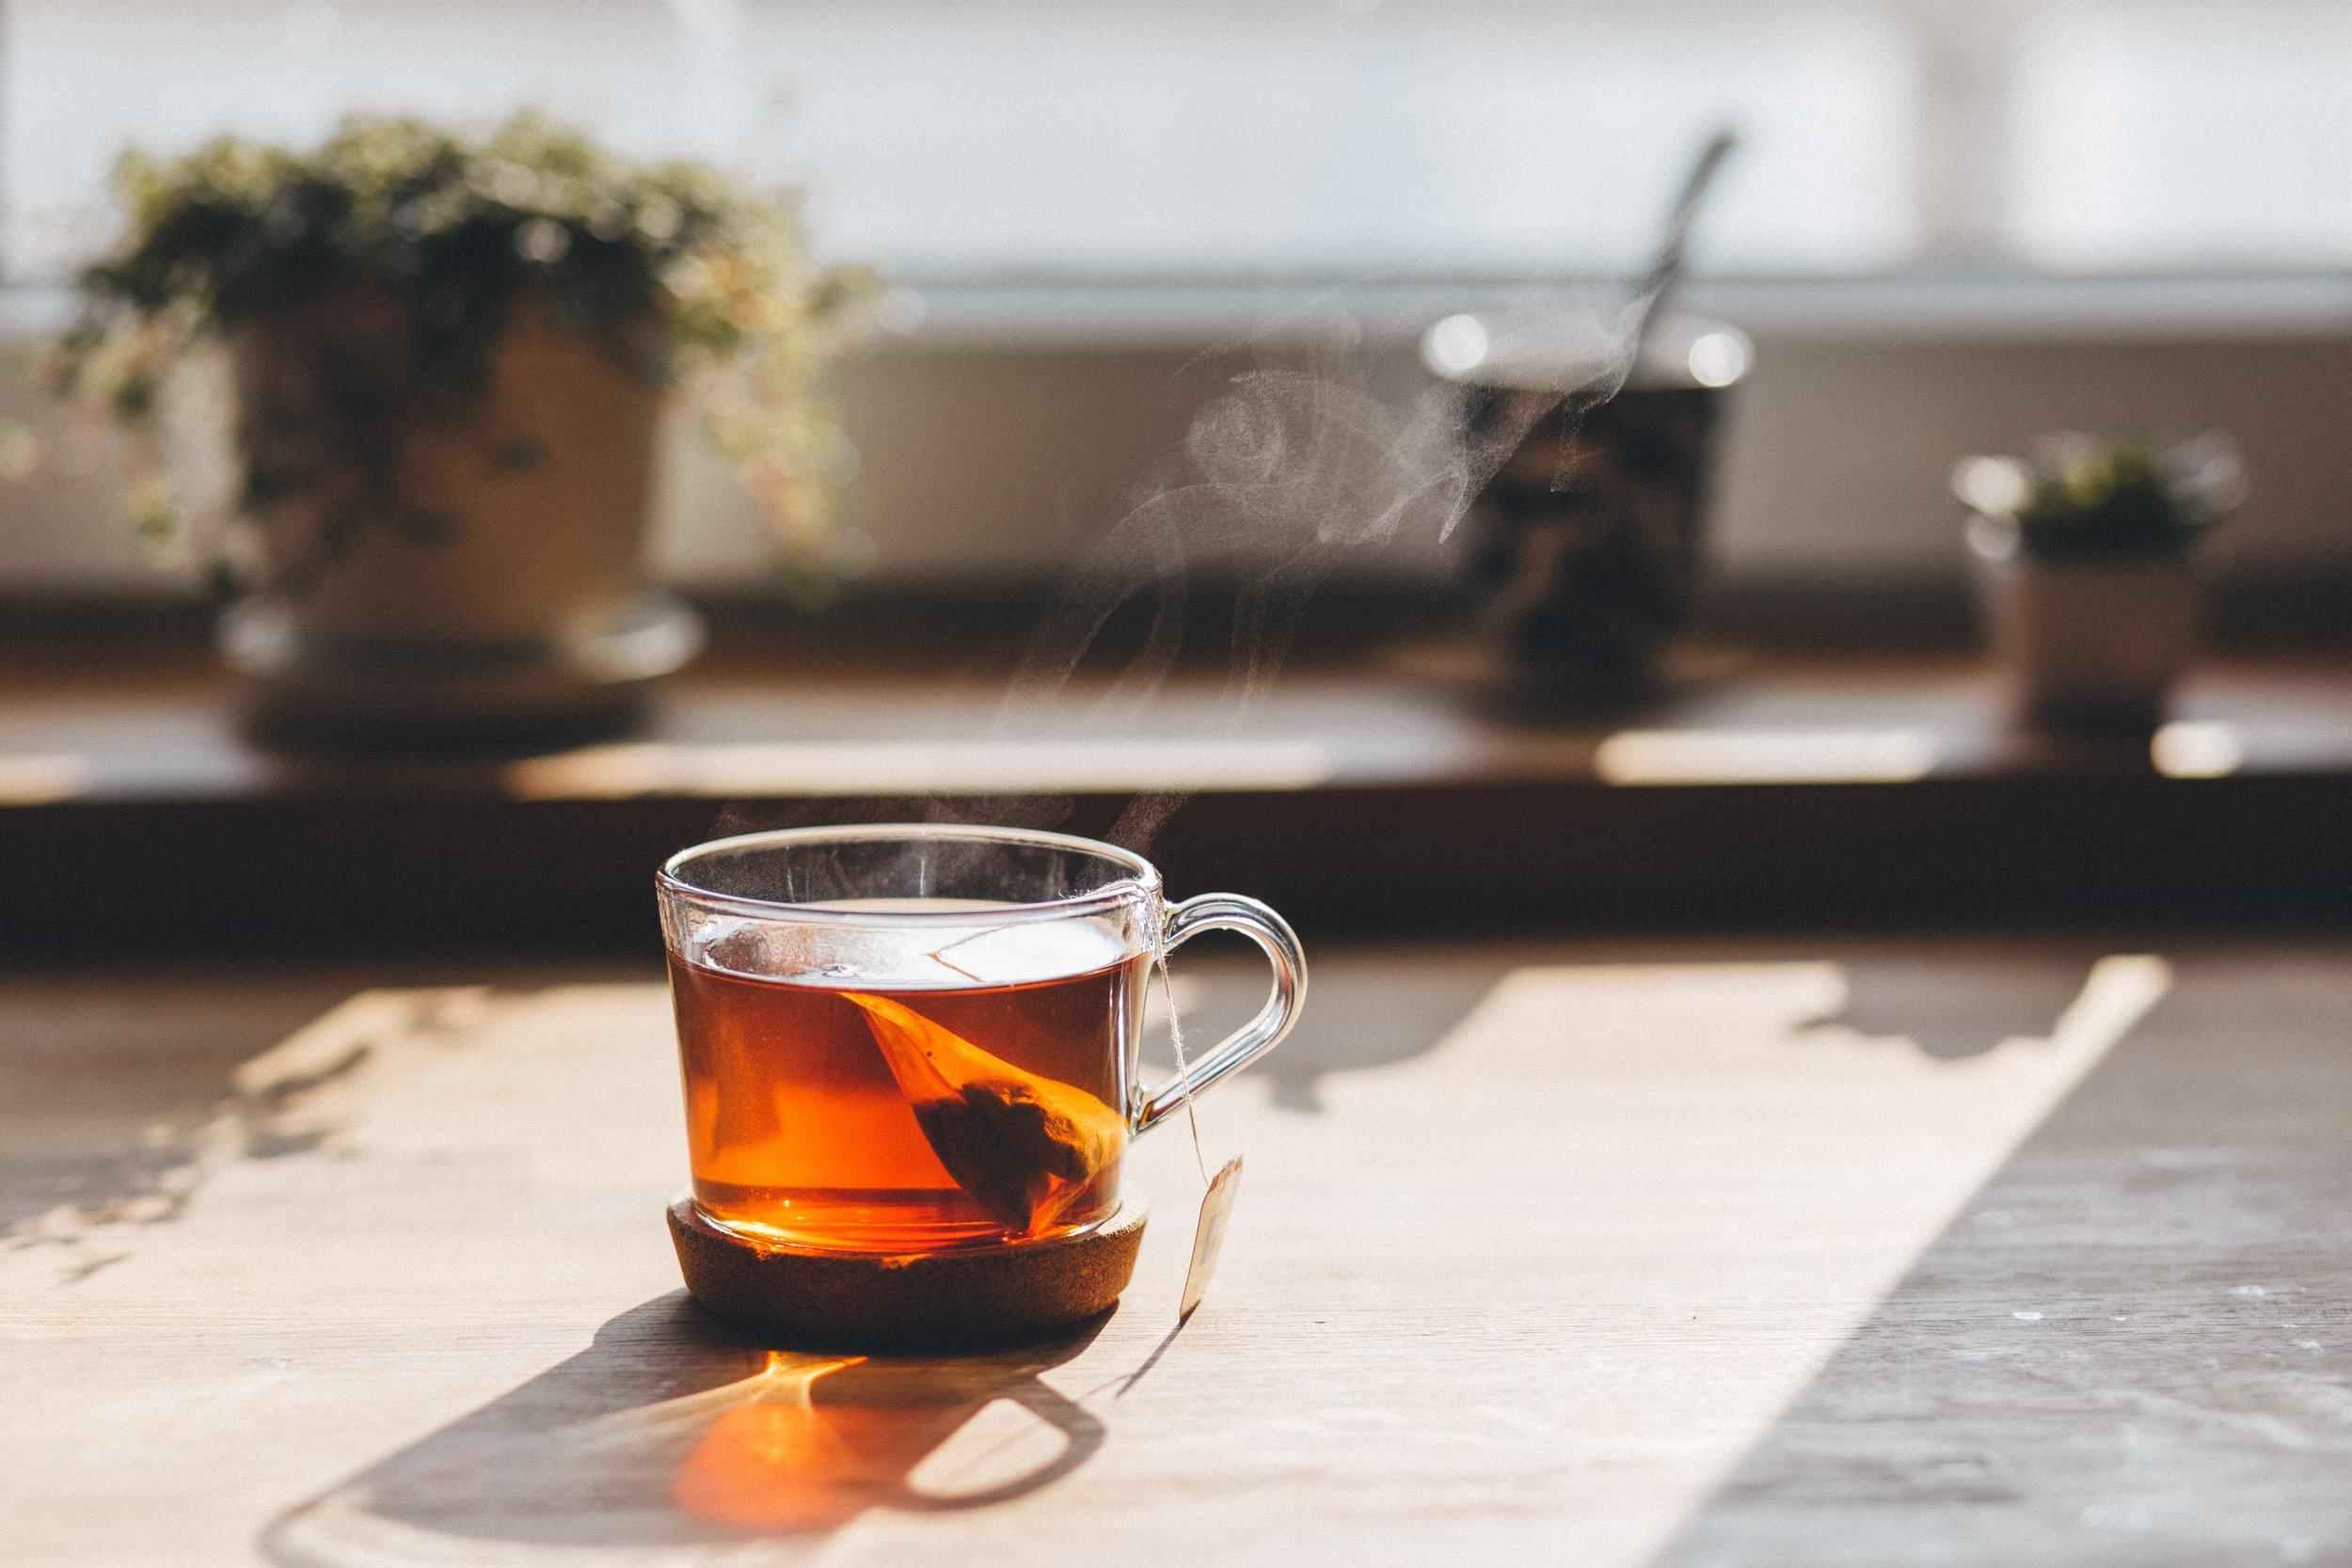 negative-space-cup-hot-tead-wood-table-joanna-malinowska.jpg